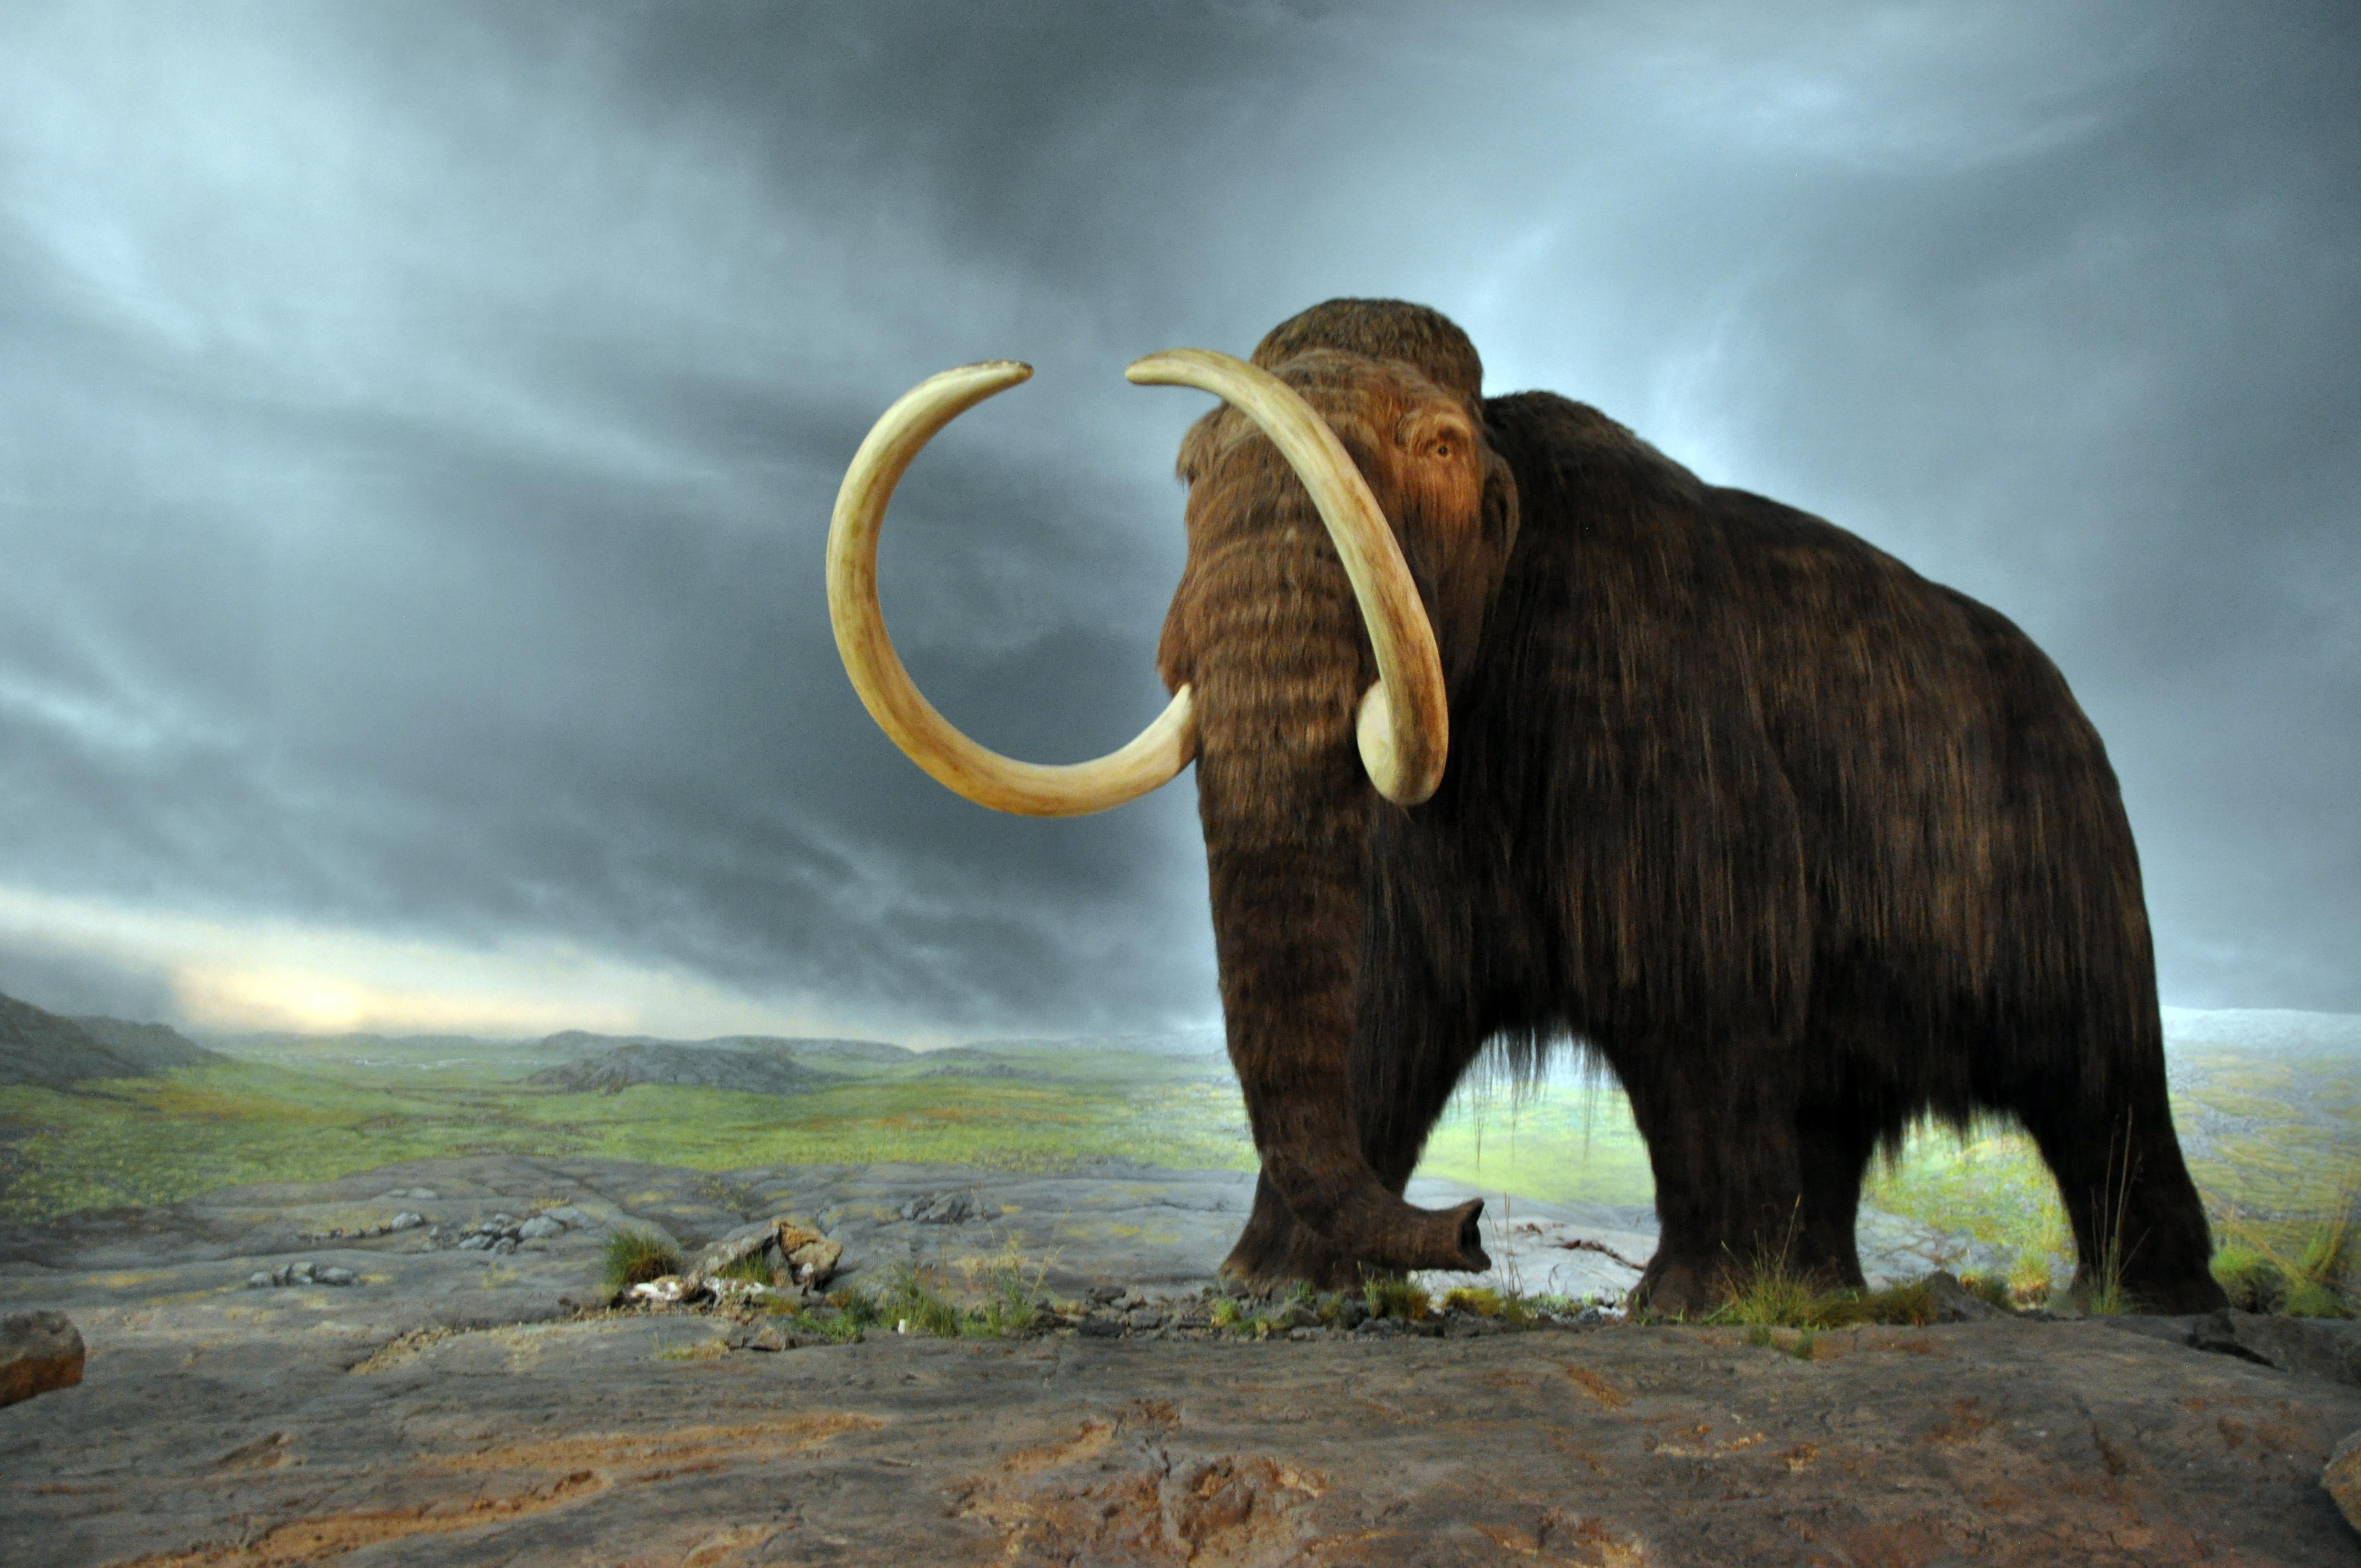 High Resolution Wallpaper | Mammoth 4288x2848 px